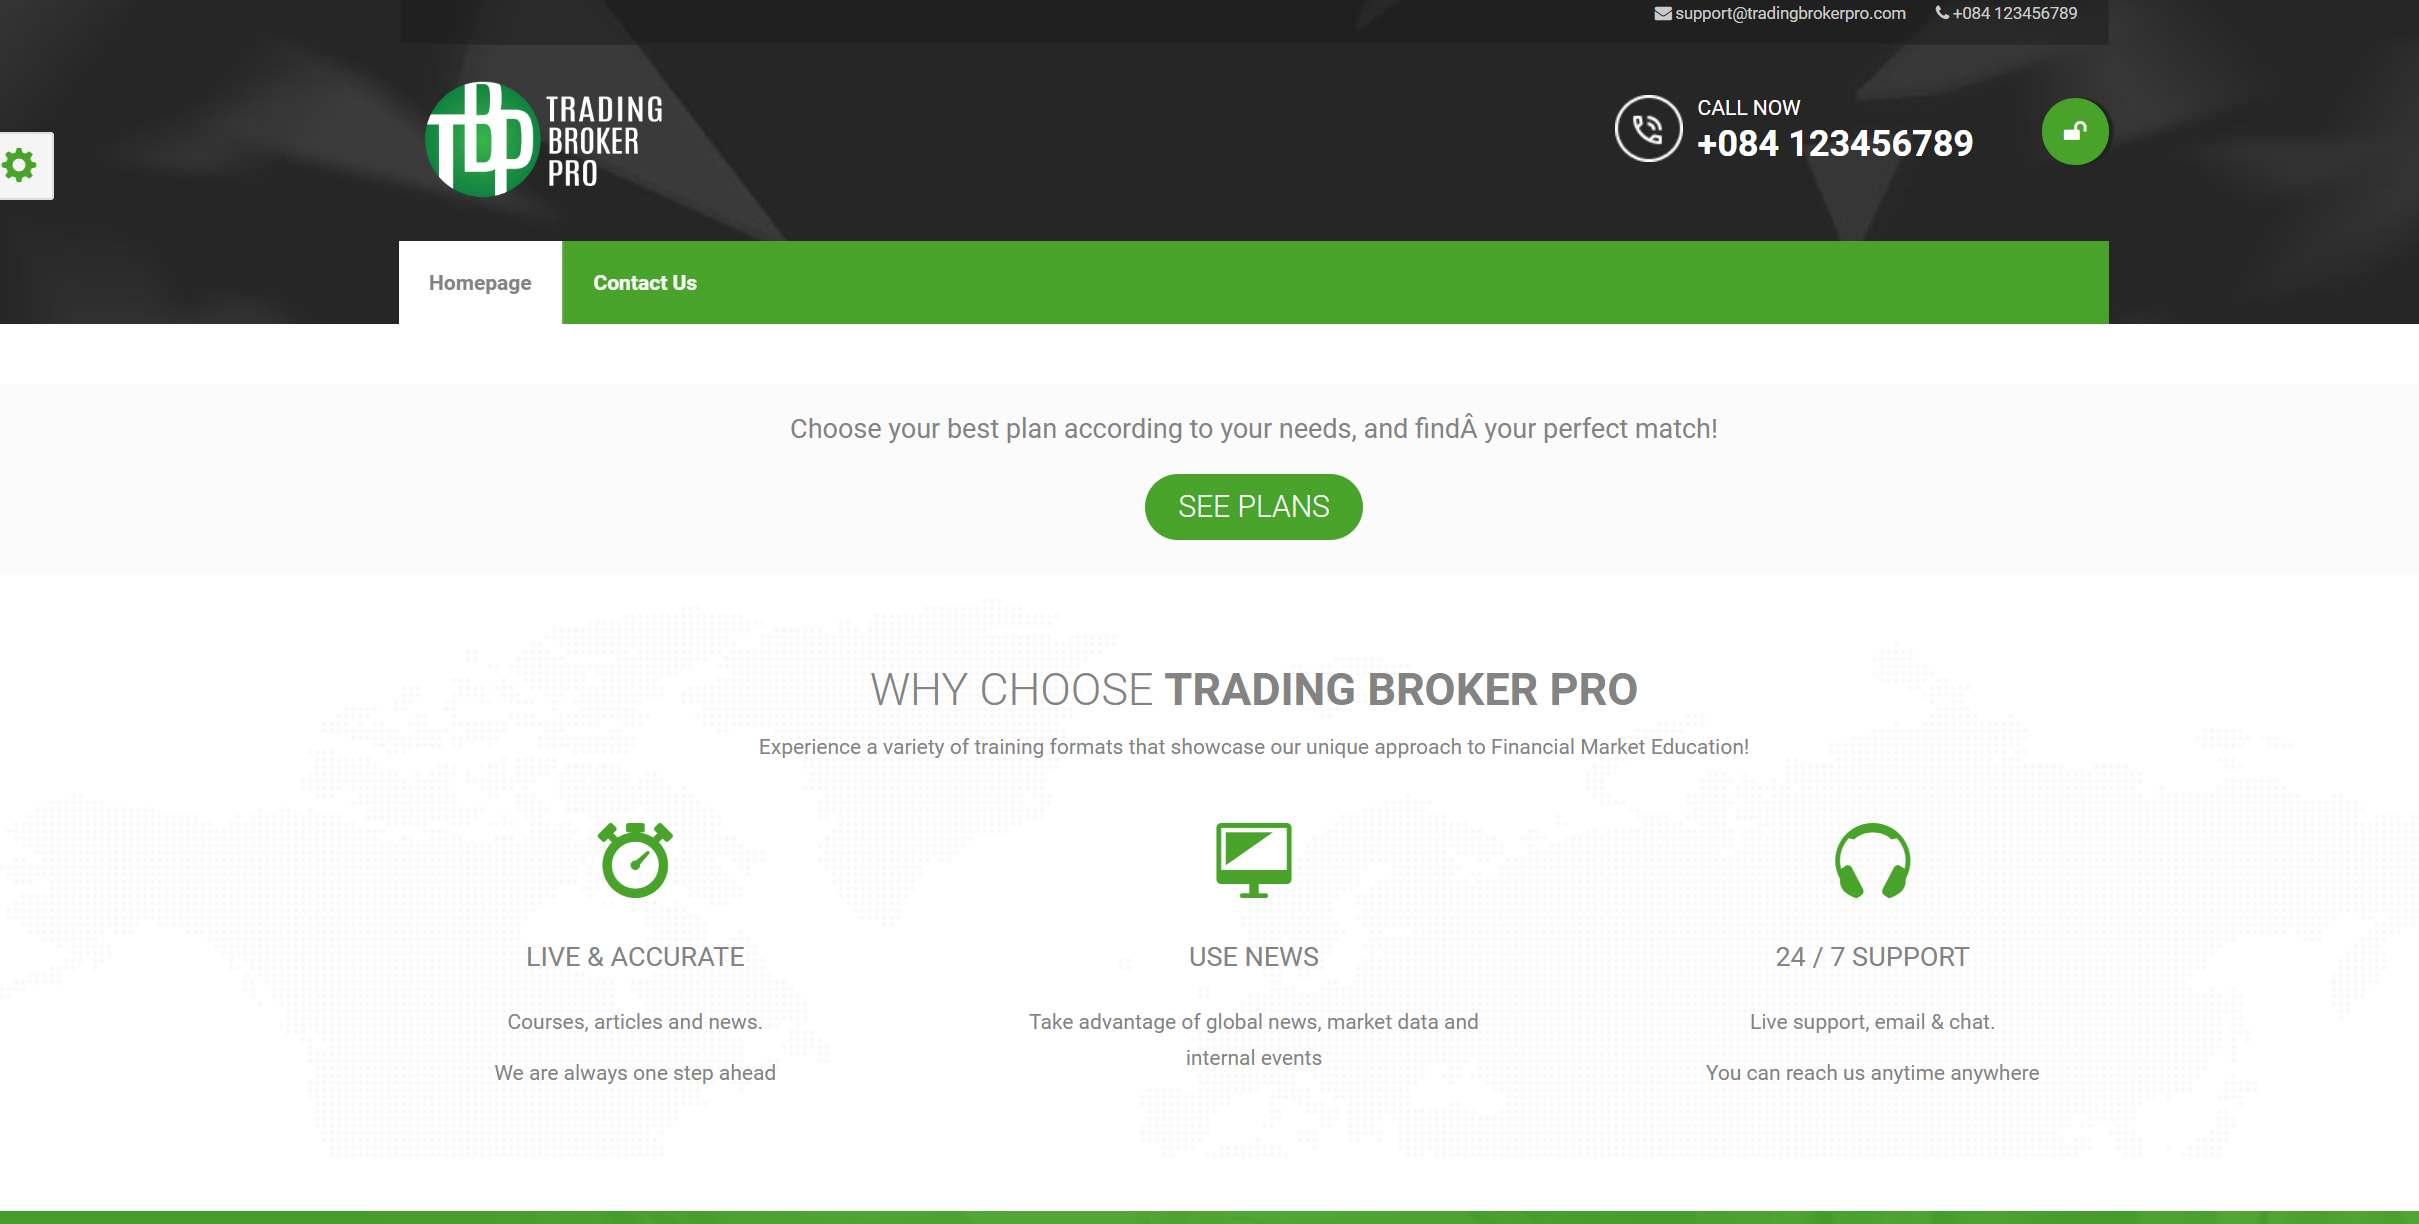 Компания TRADING BROKER PRO – брокер-лохотронщик. Краткий анализ обзор tradingbrokerpro.com